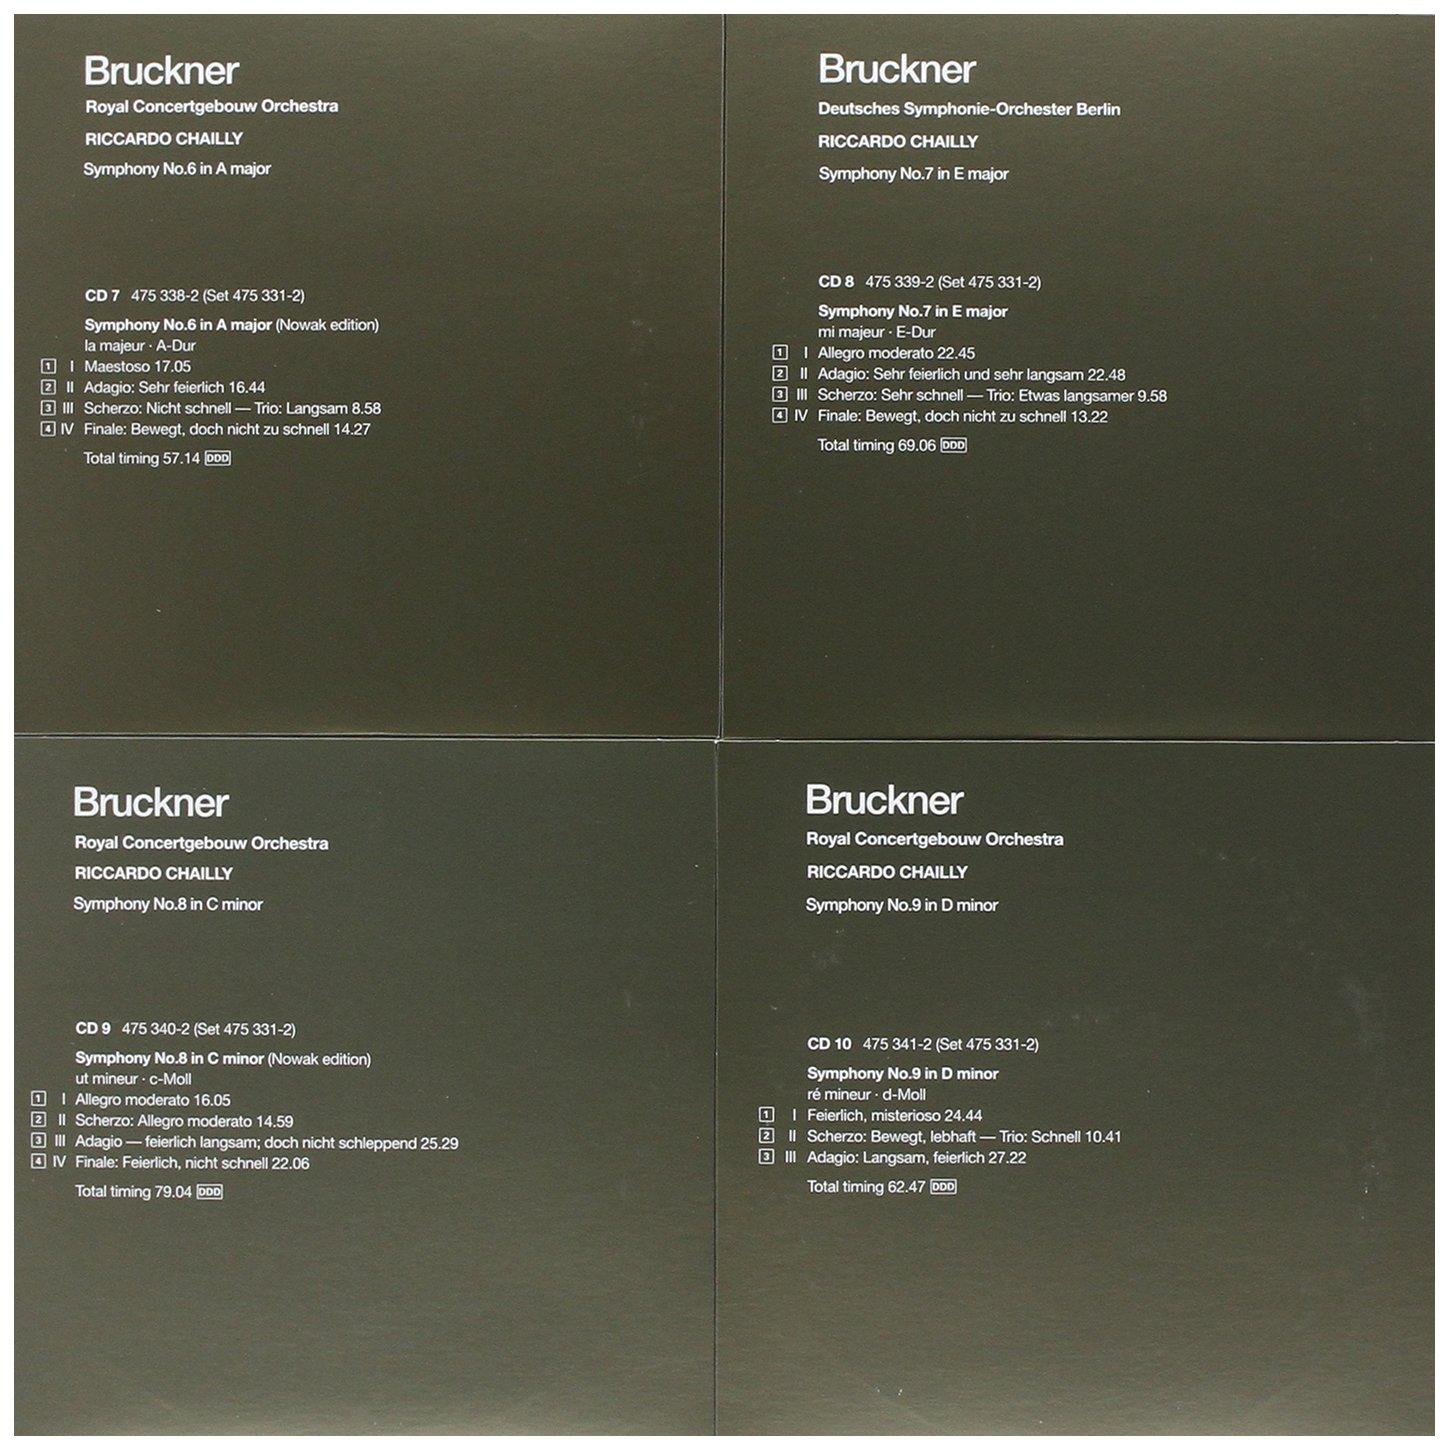 Bruckner: The Symphonies by Decca